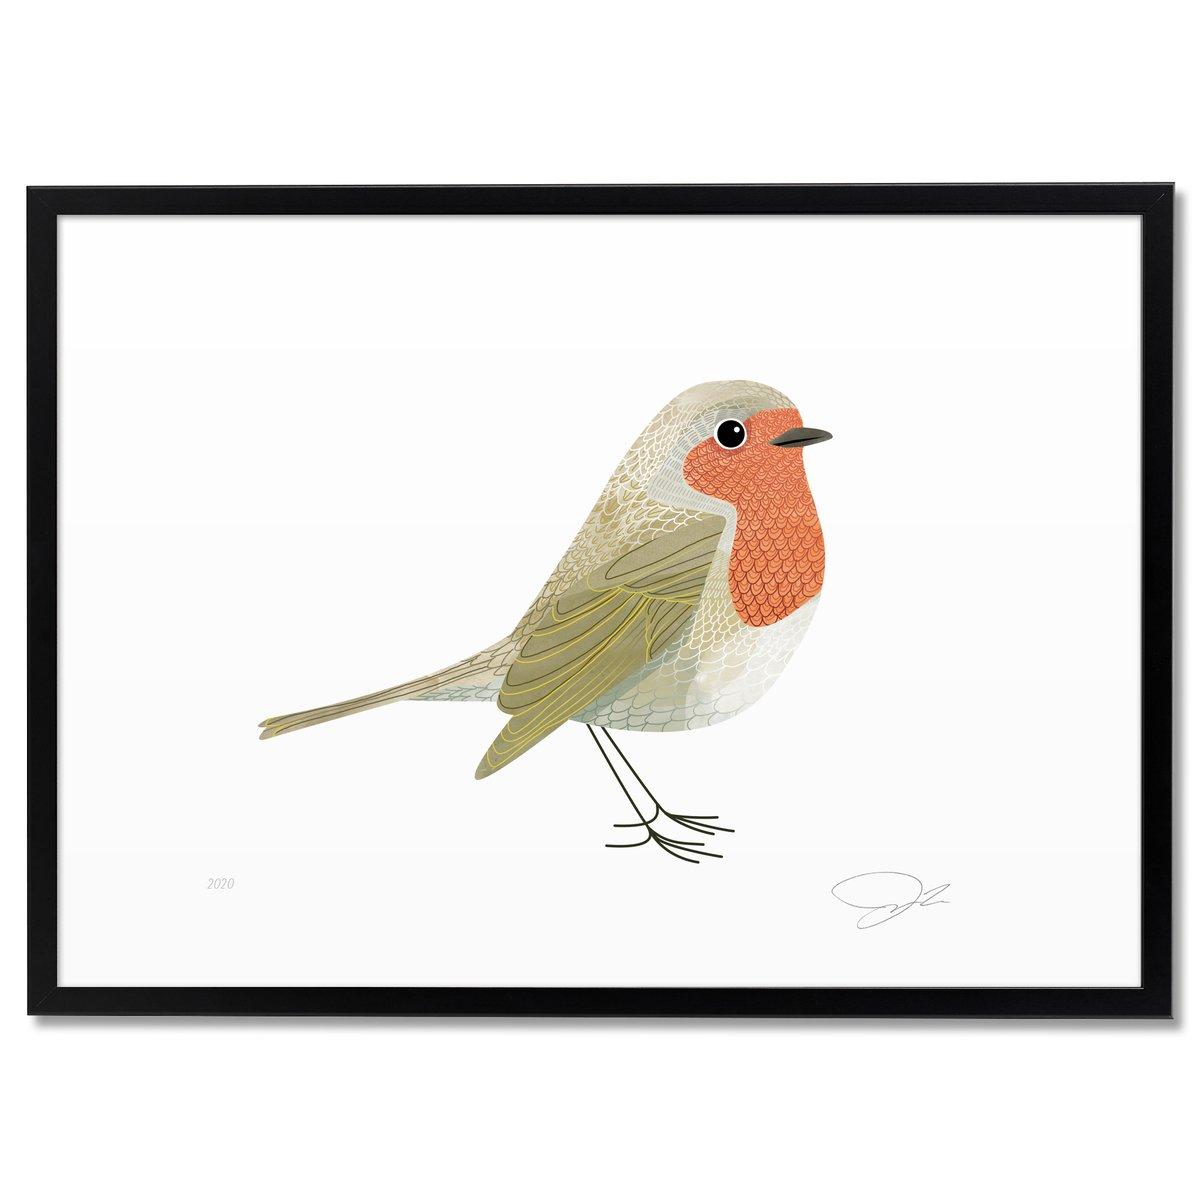 Image of Print: Robin